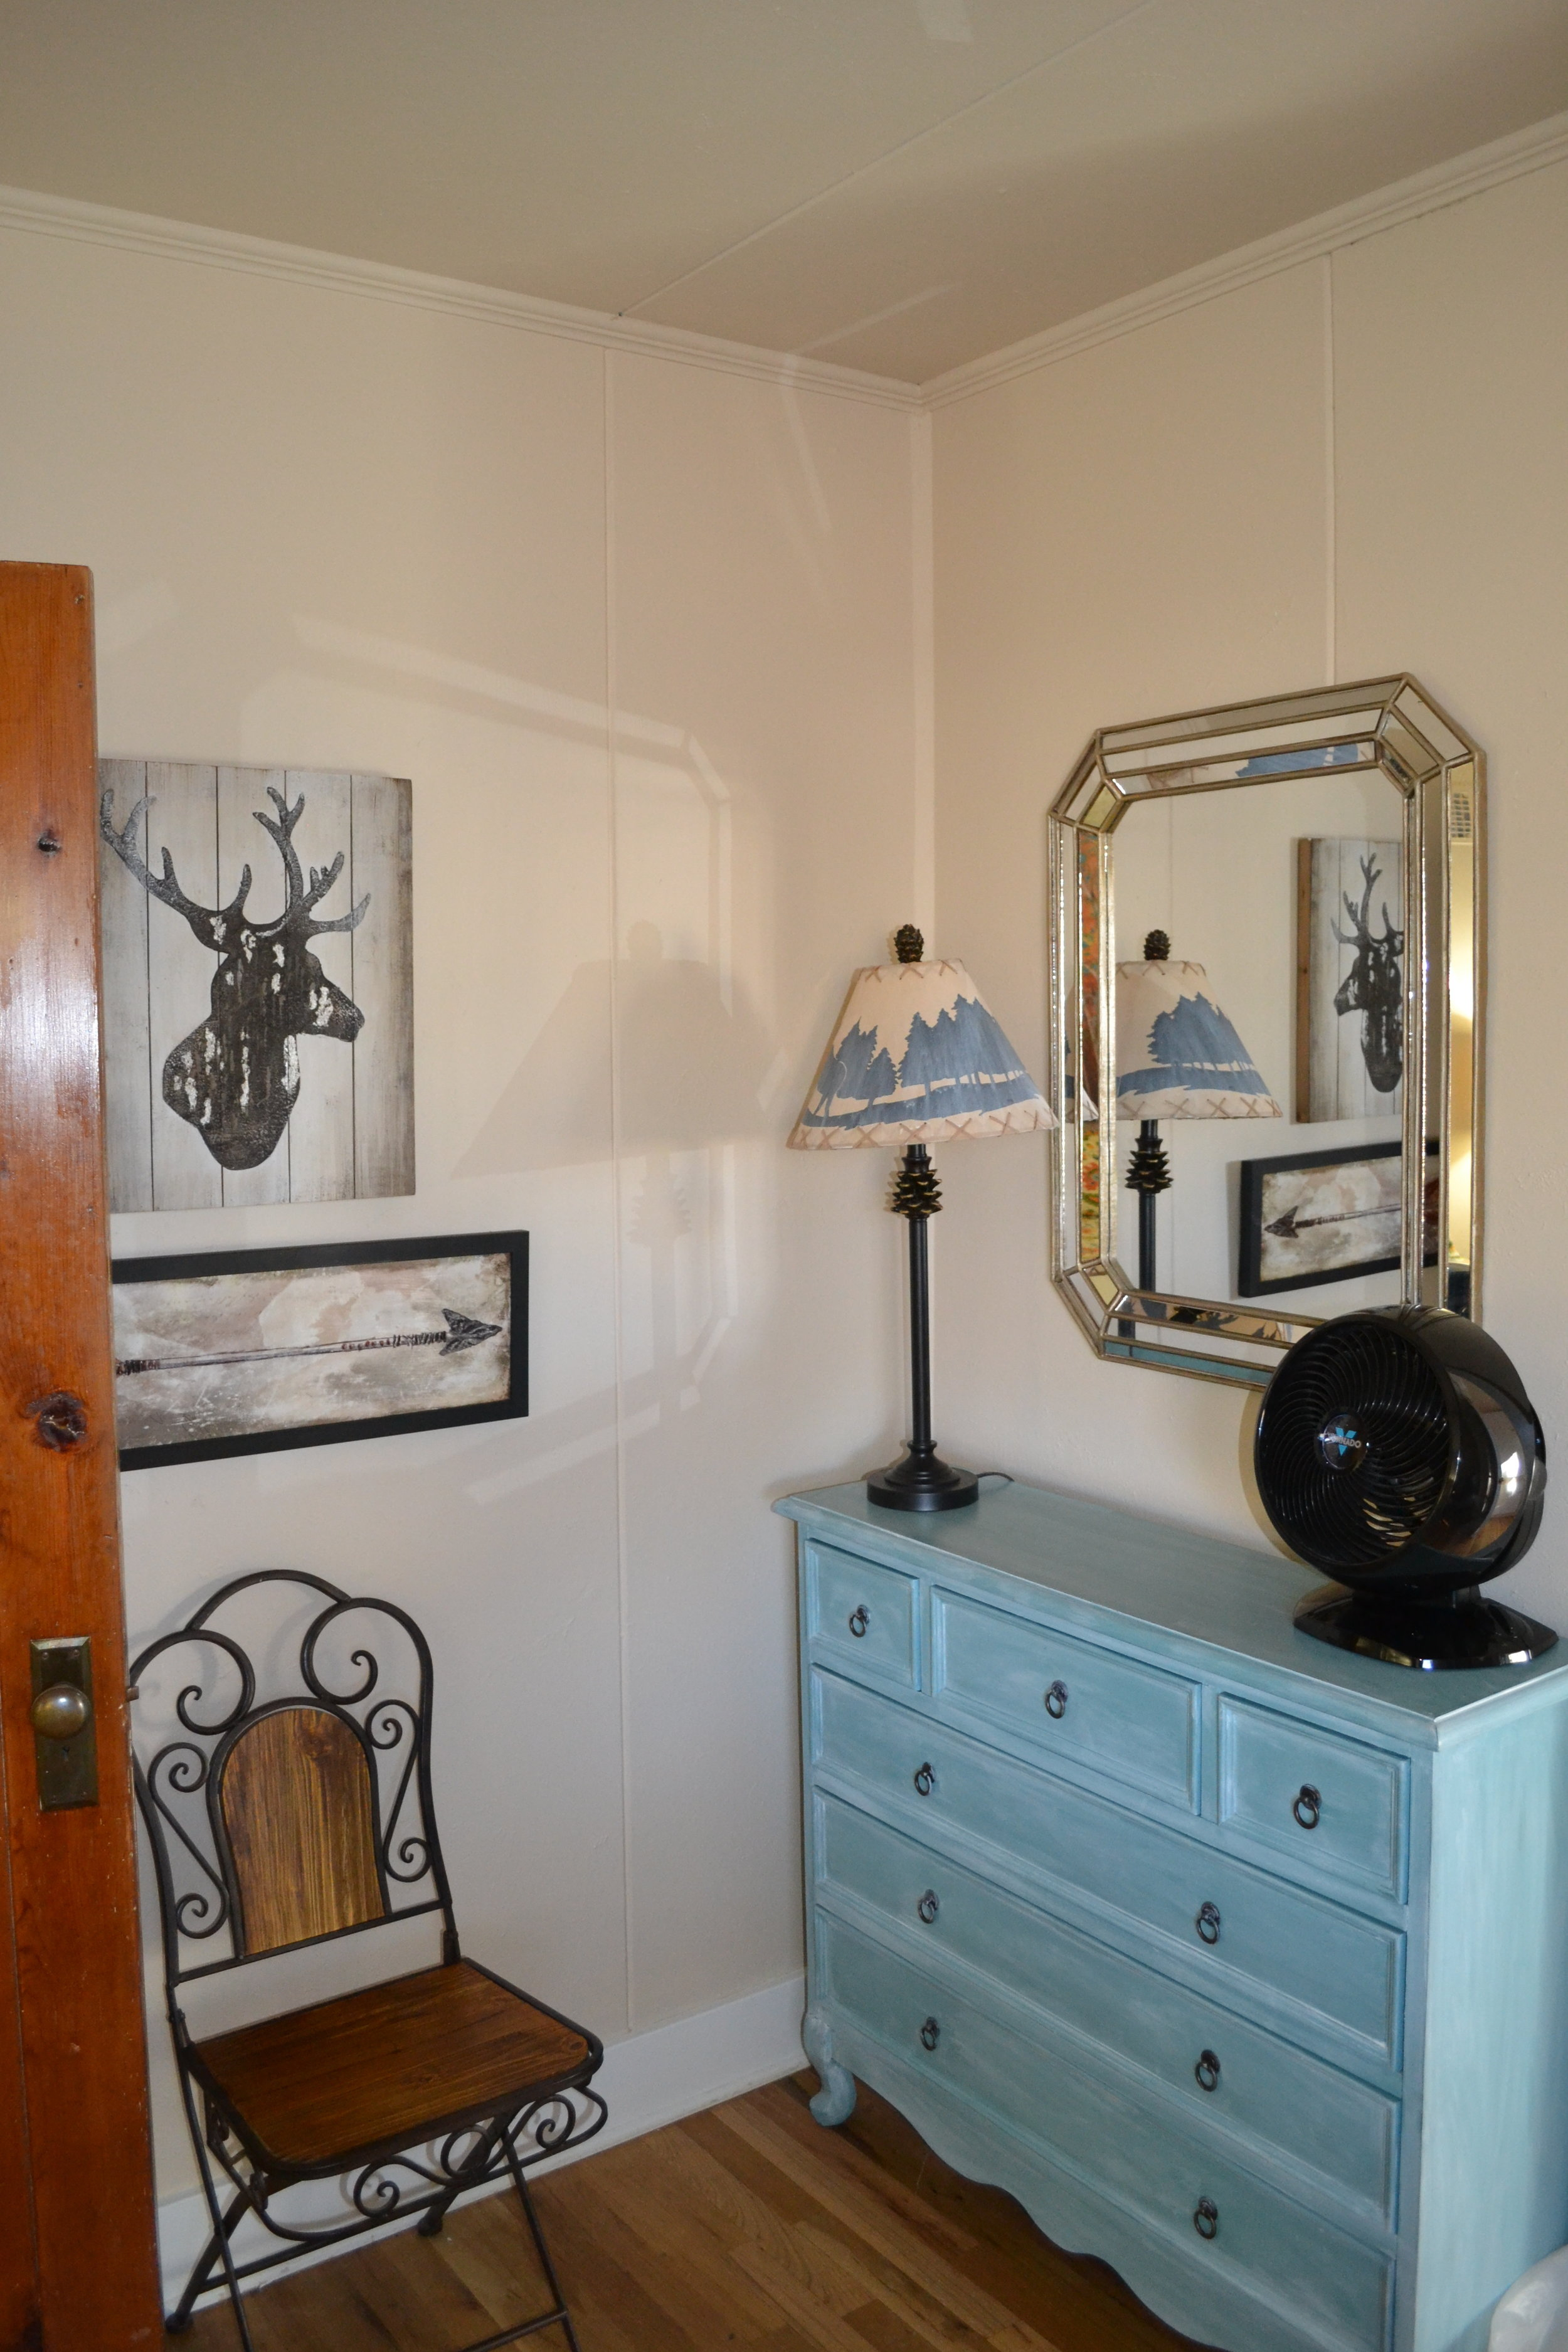 Confer - Bedroom